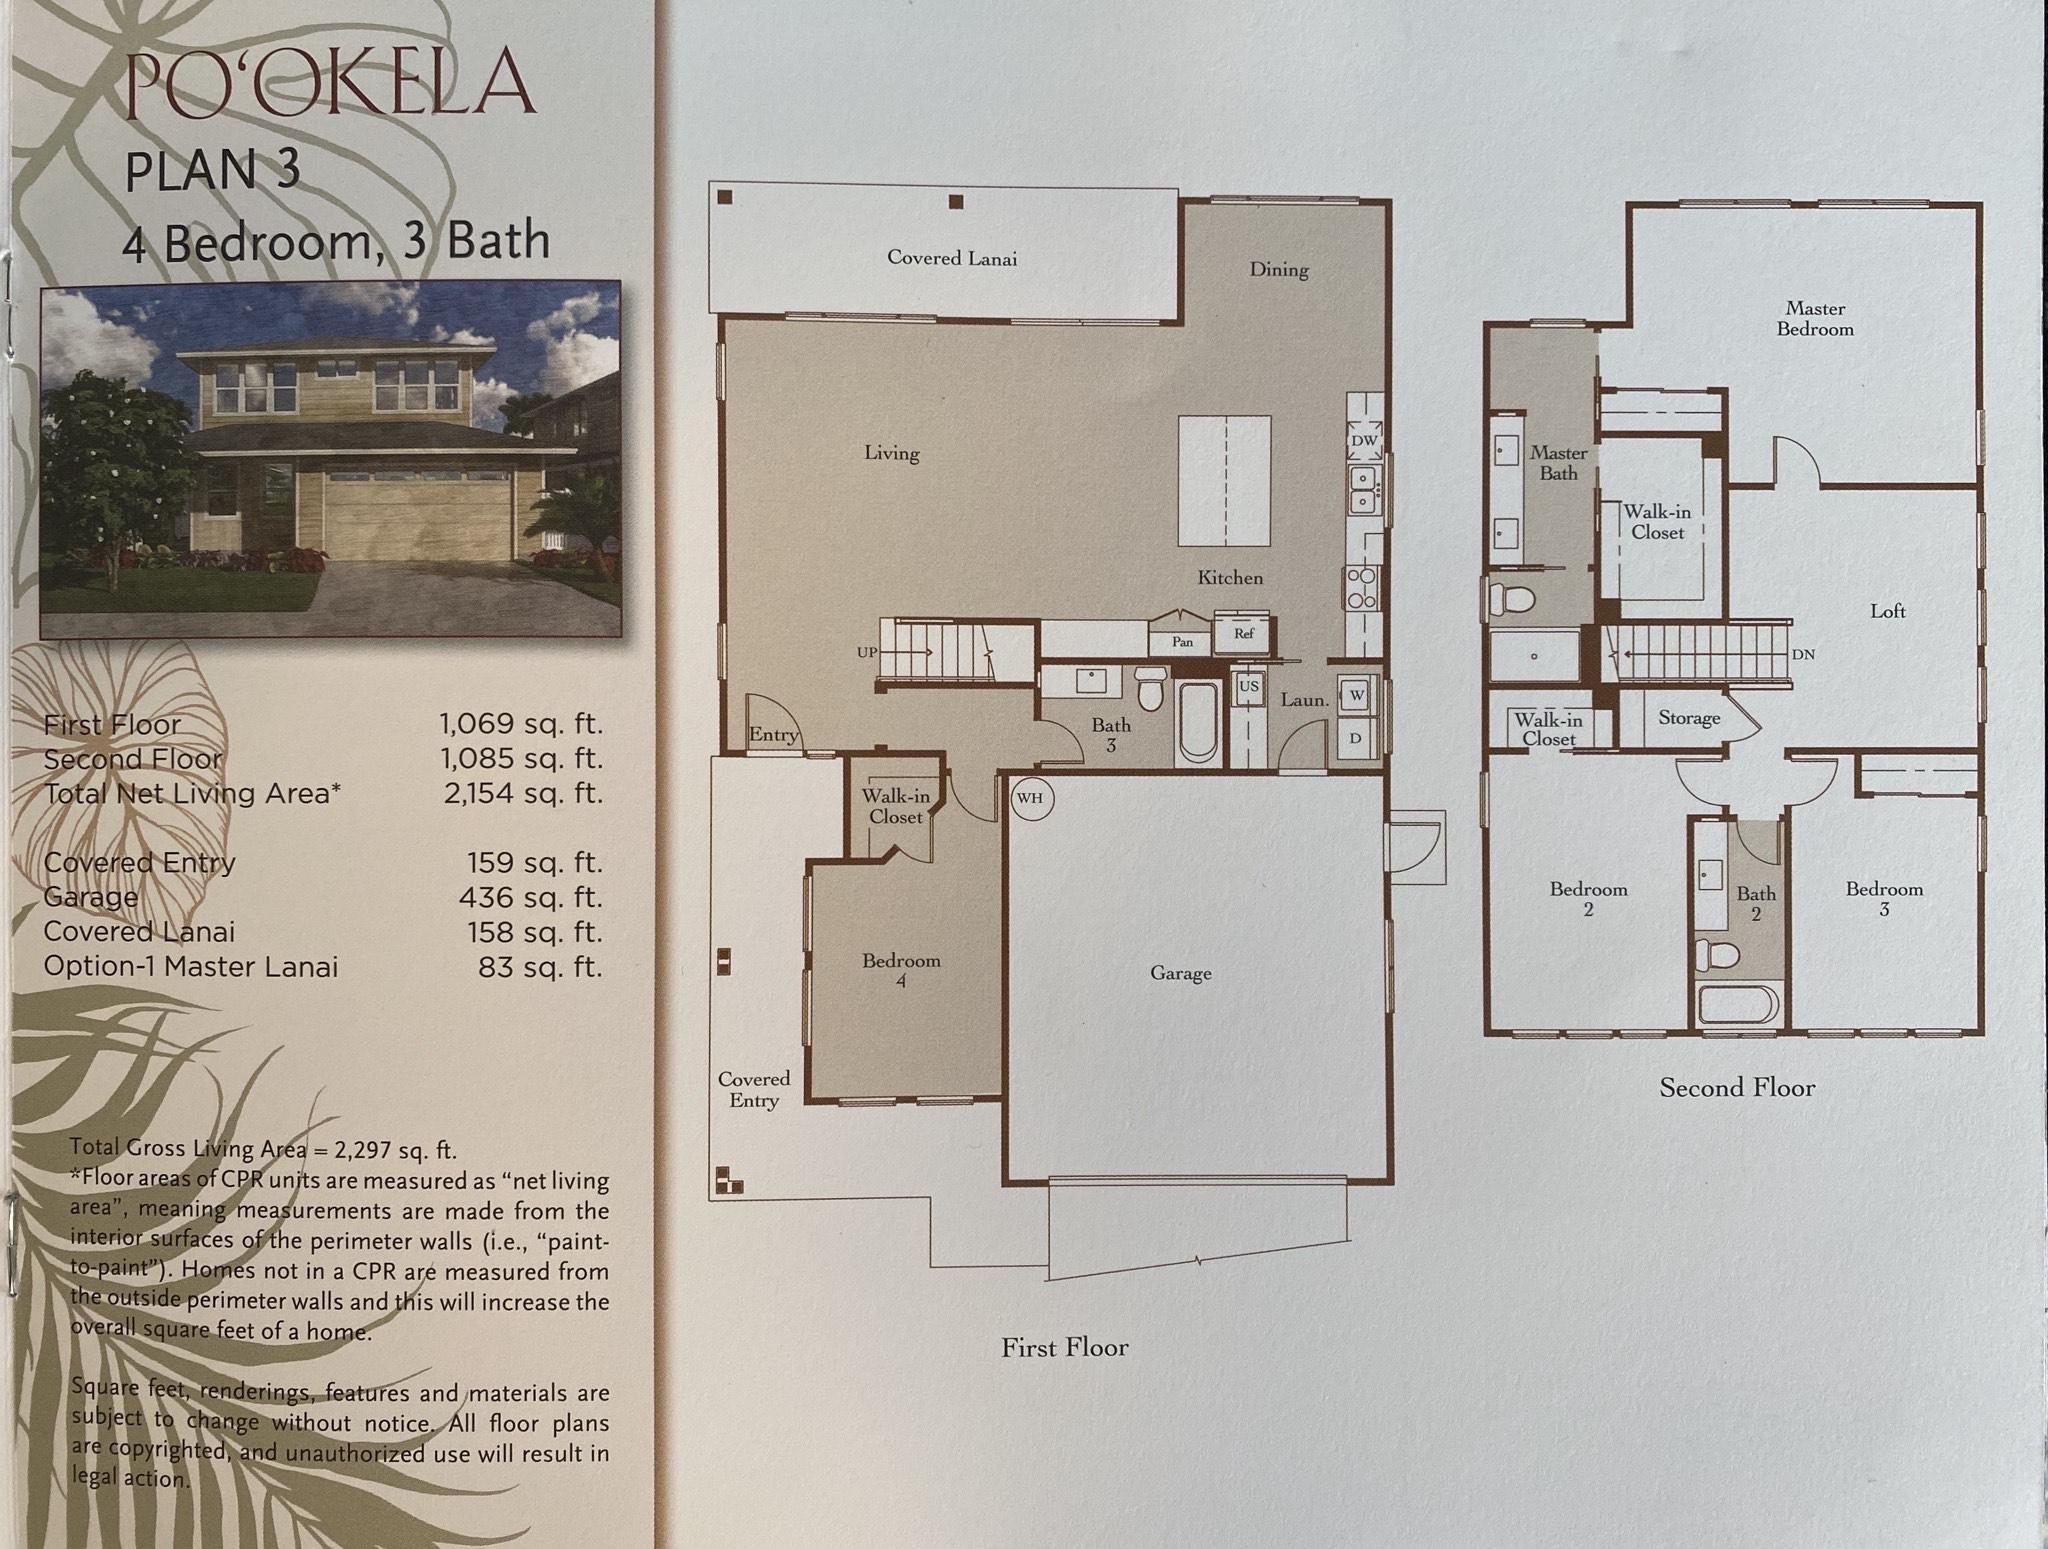 Kealii Pookela Floor Plan 3